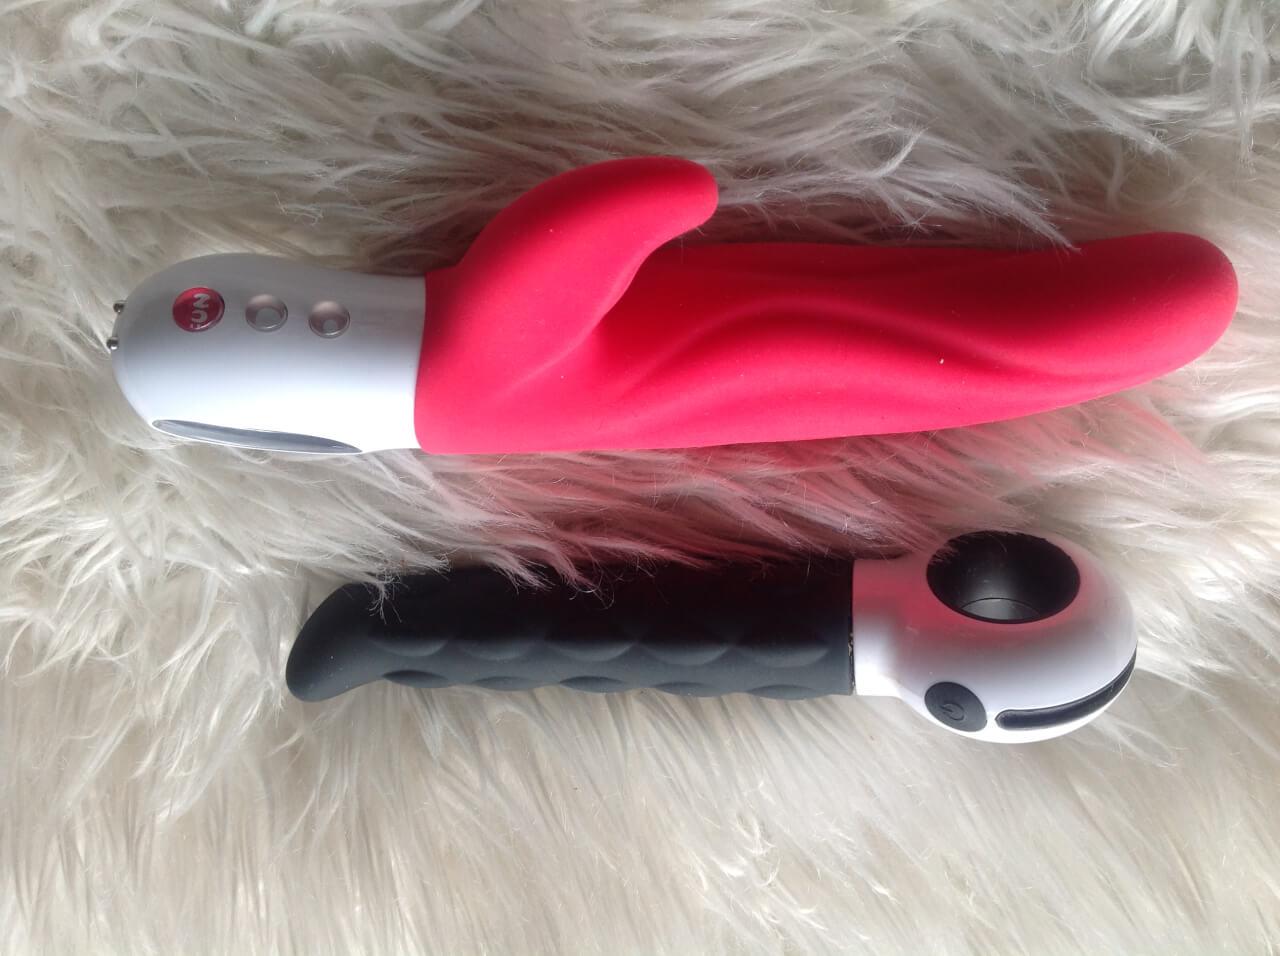 Roze Lady Bi vibrator van Funfactory en de Delight